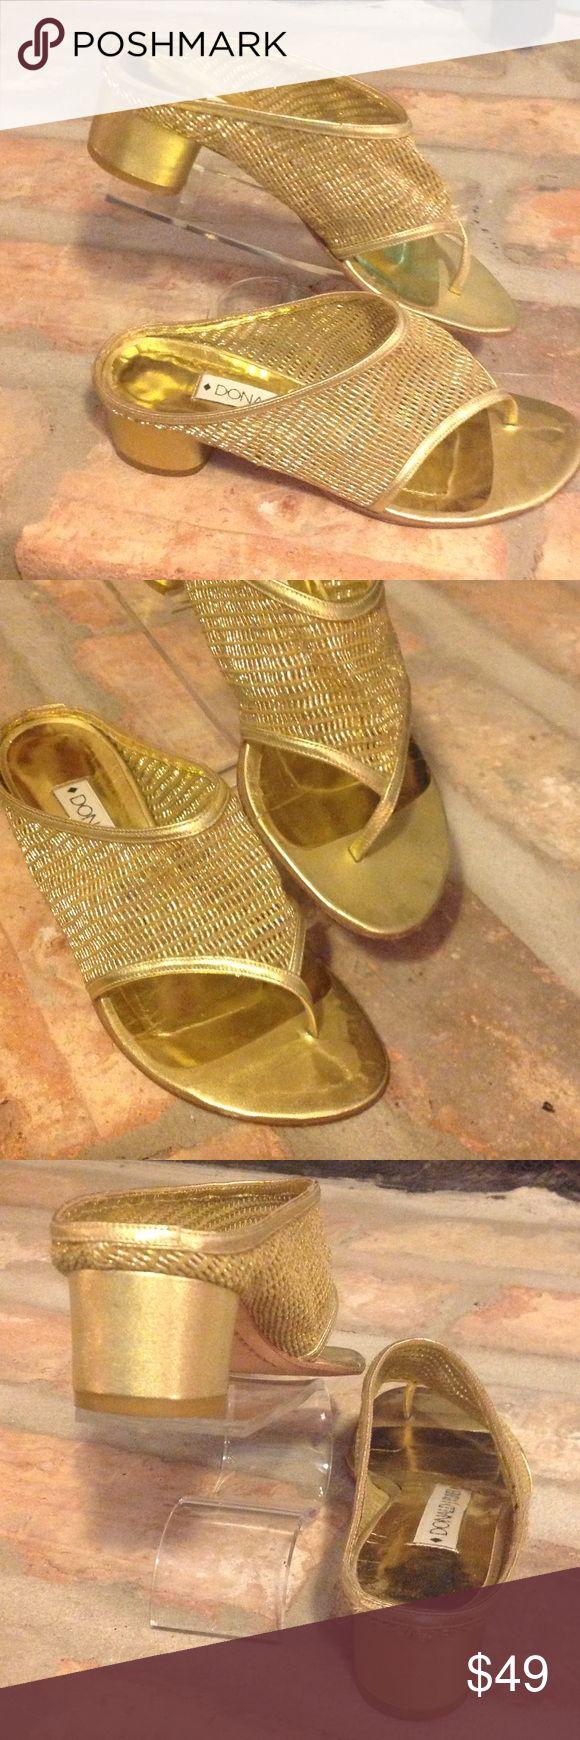 "Donald J Pliner Gold Sandal Heel Very nice gold metallic slide in dressy sandal 1.5"" heel. Excellent condition. Just normal wear to bottom sole. Nice round gold metallic heels. Donald J. Pliner Shoes Sandals"